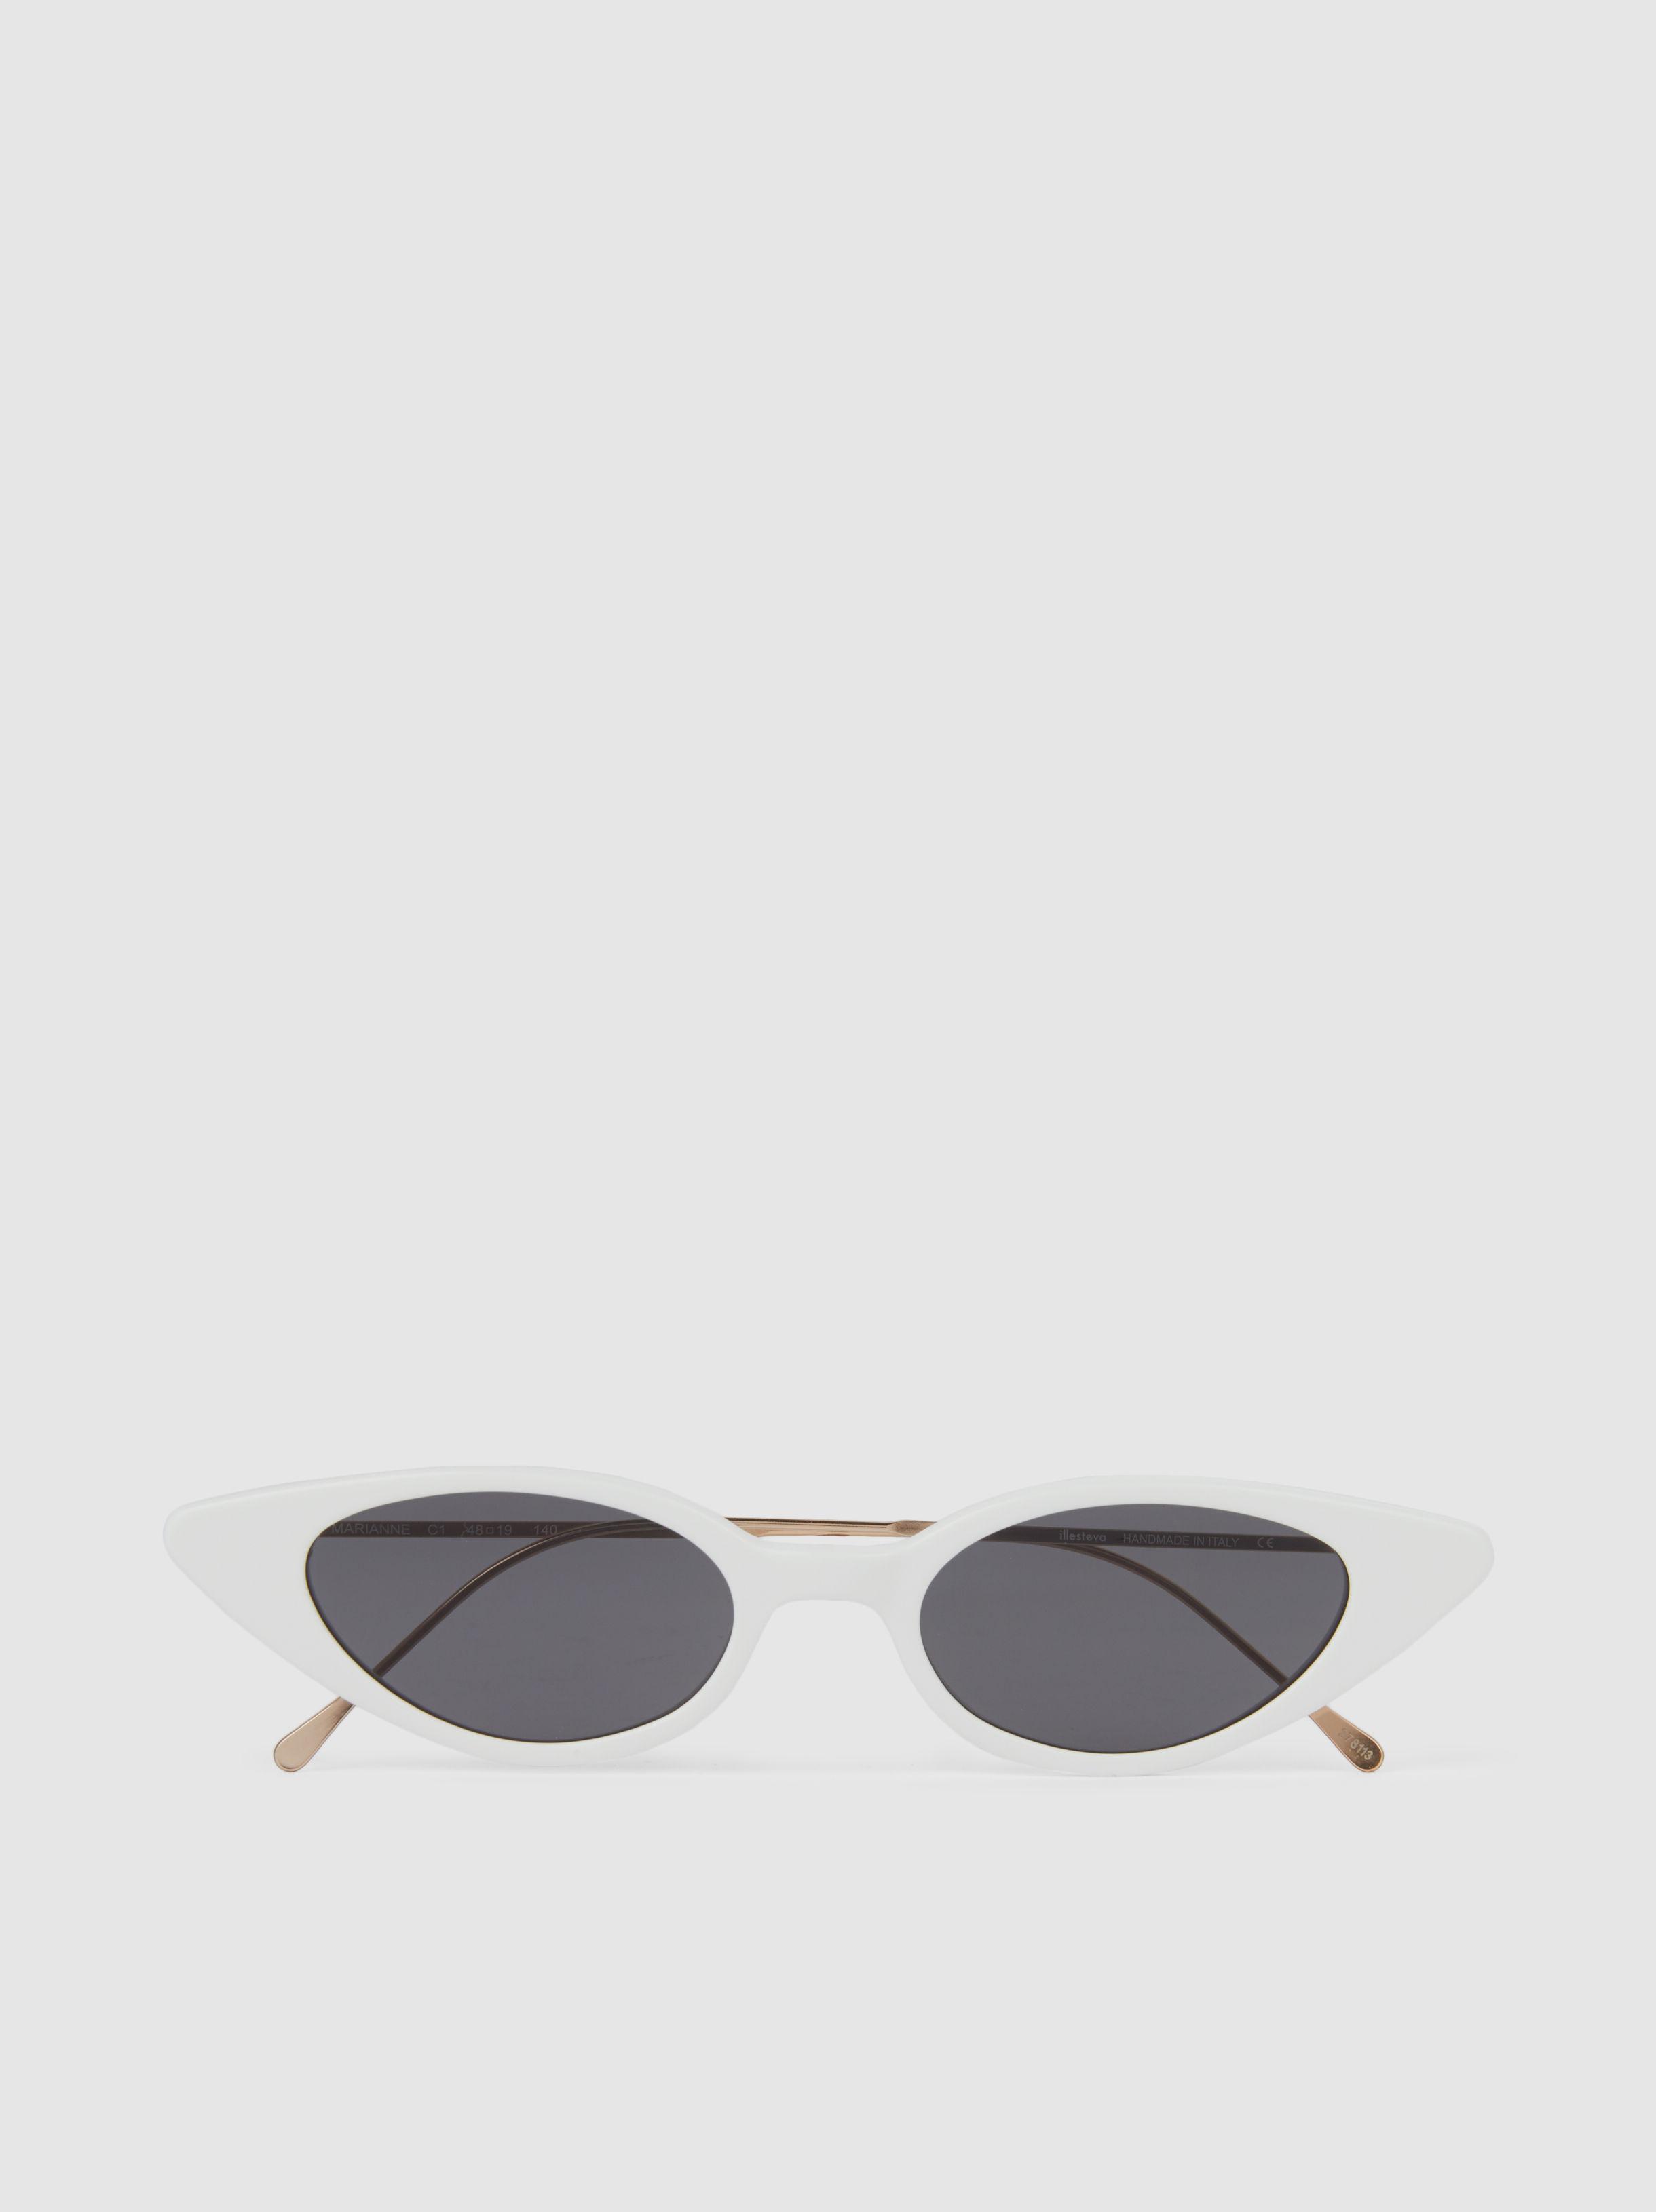 4ae21dab82f Illesteva Marianne Sunglasses in White - Save 14% - Lyst